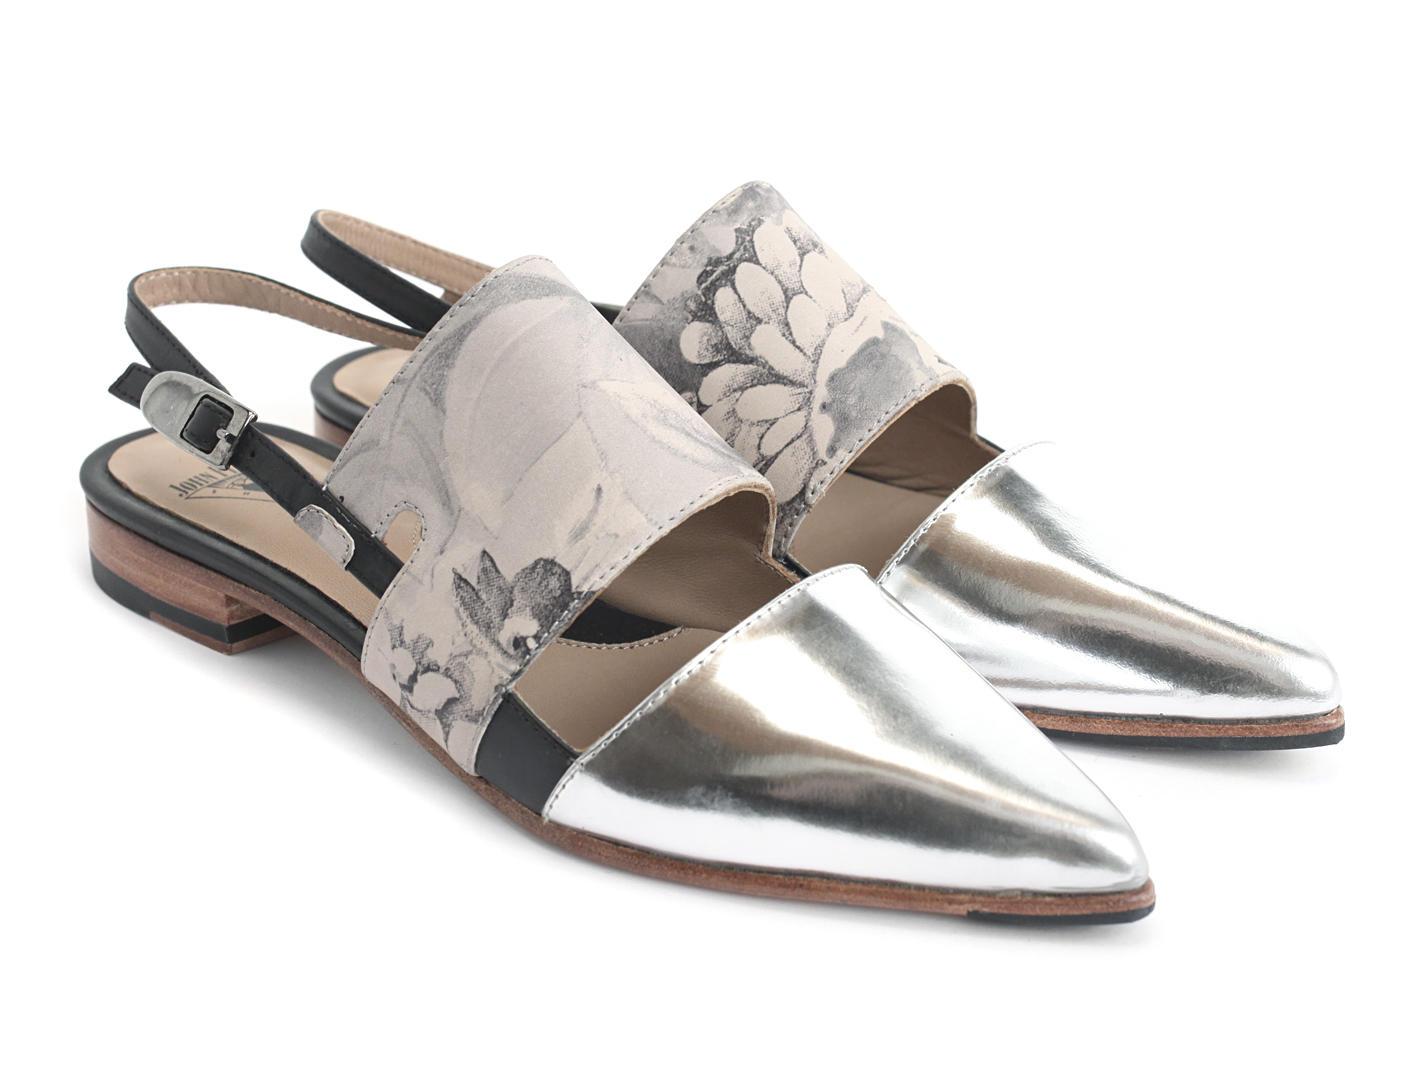 Flat Shoes In Australia